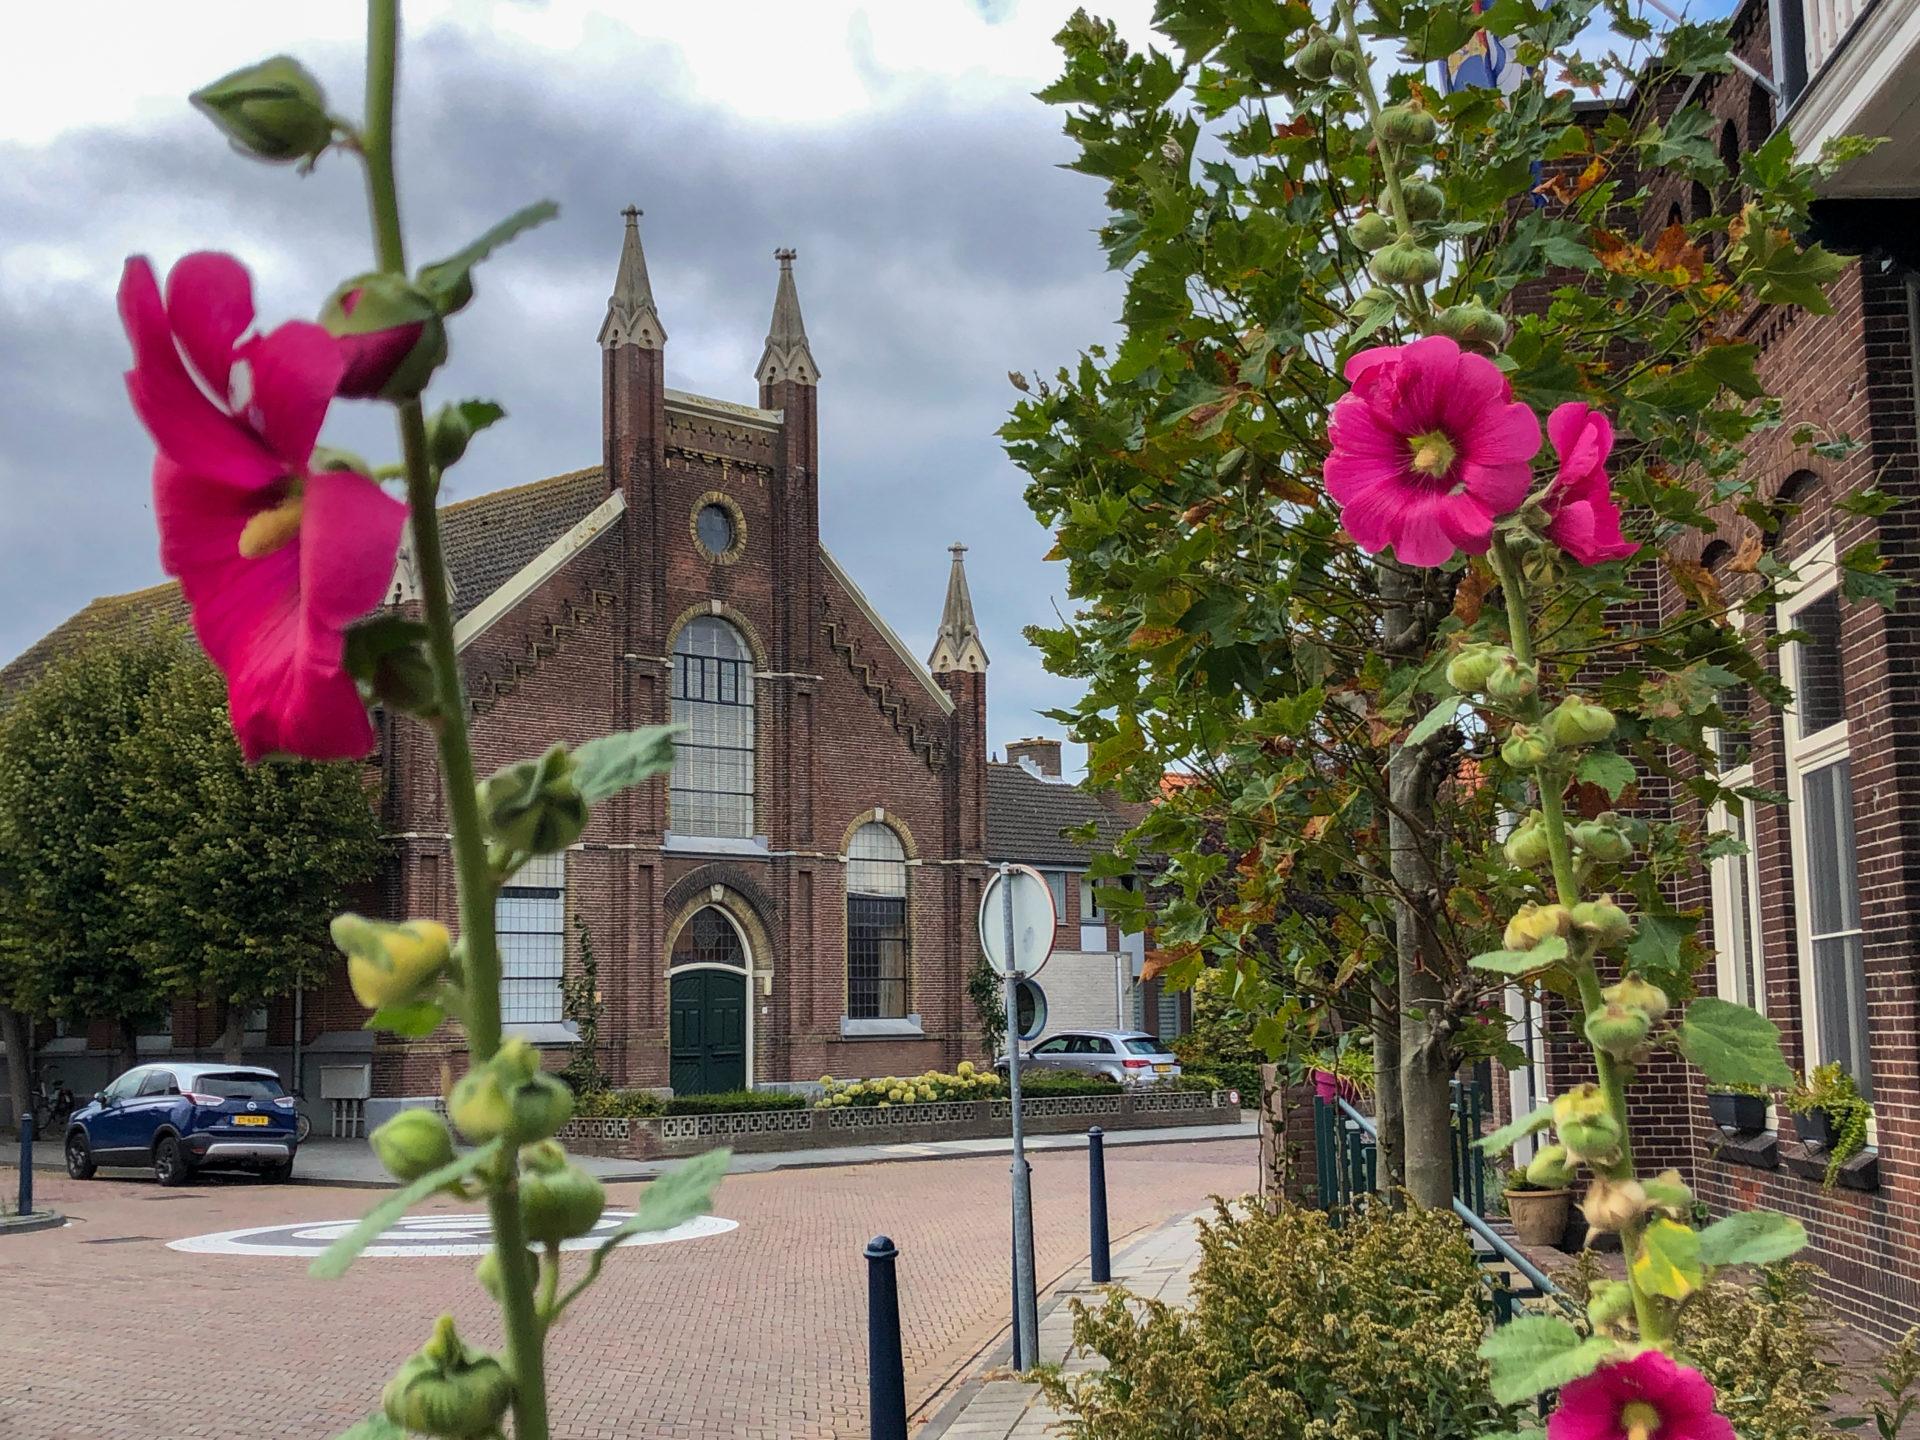 Kirche mit Dünenrosen in Yerseke in Zeeland.